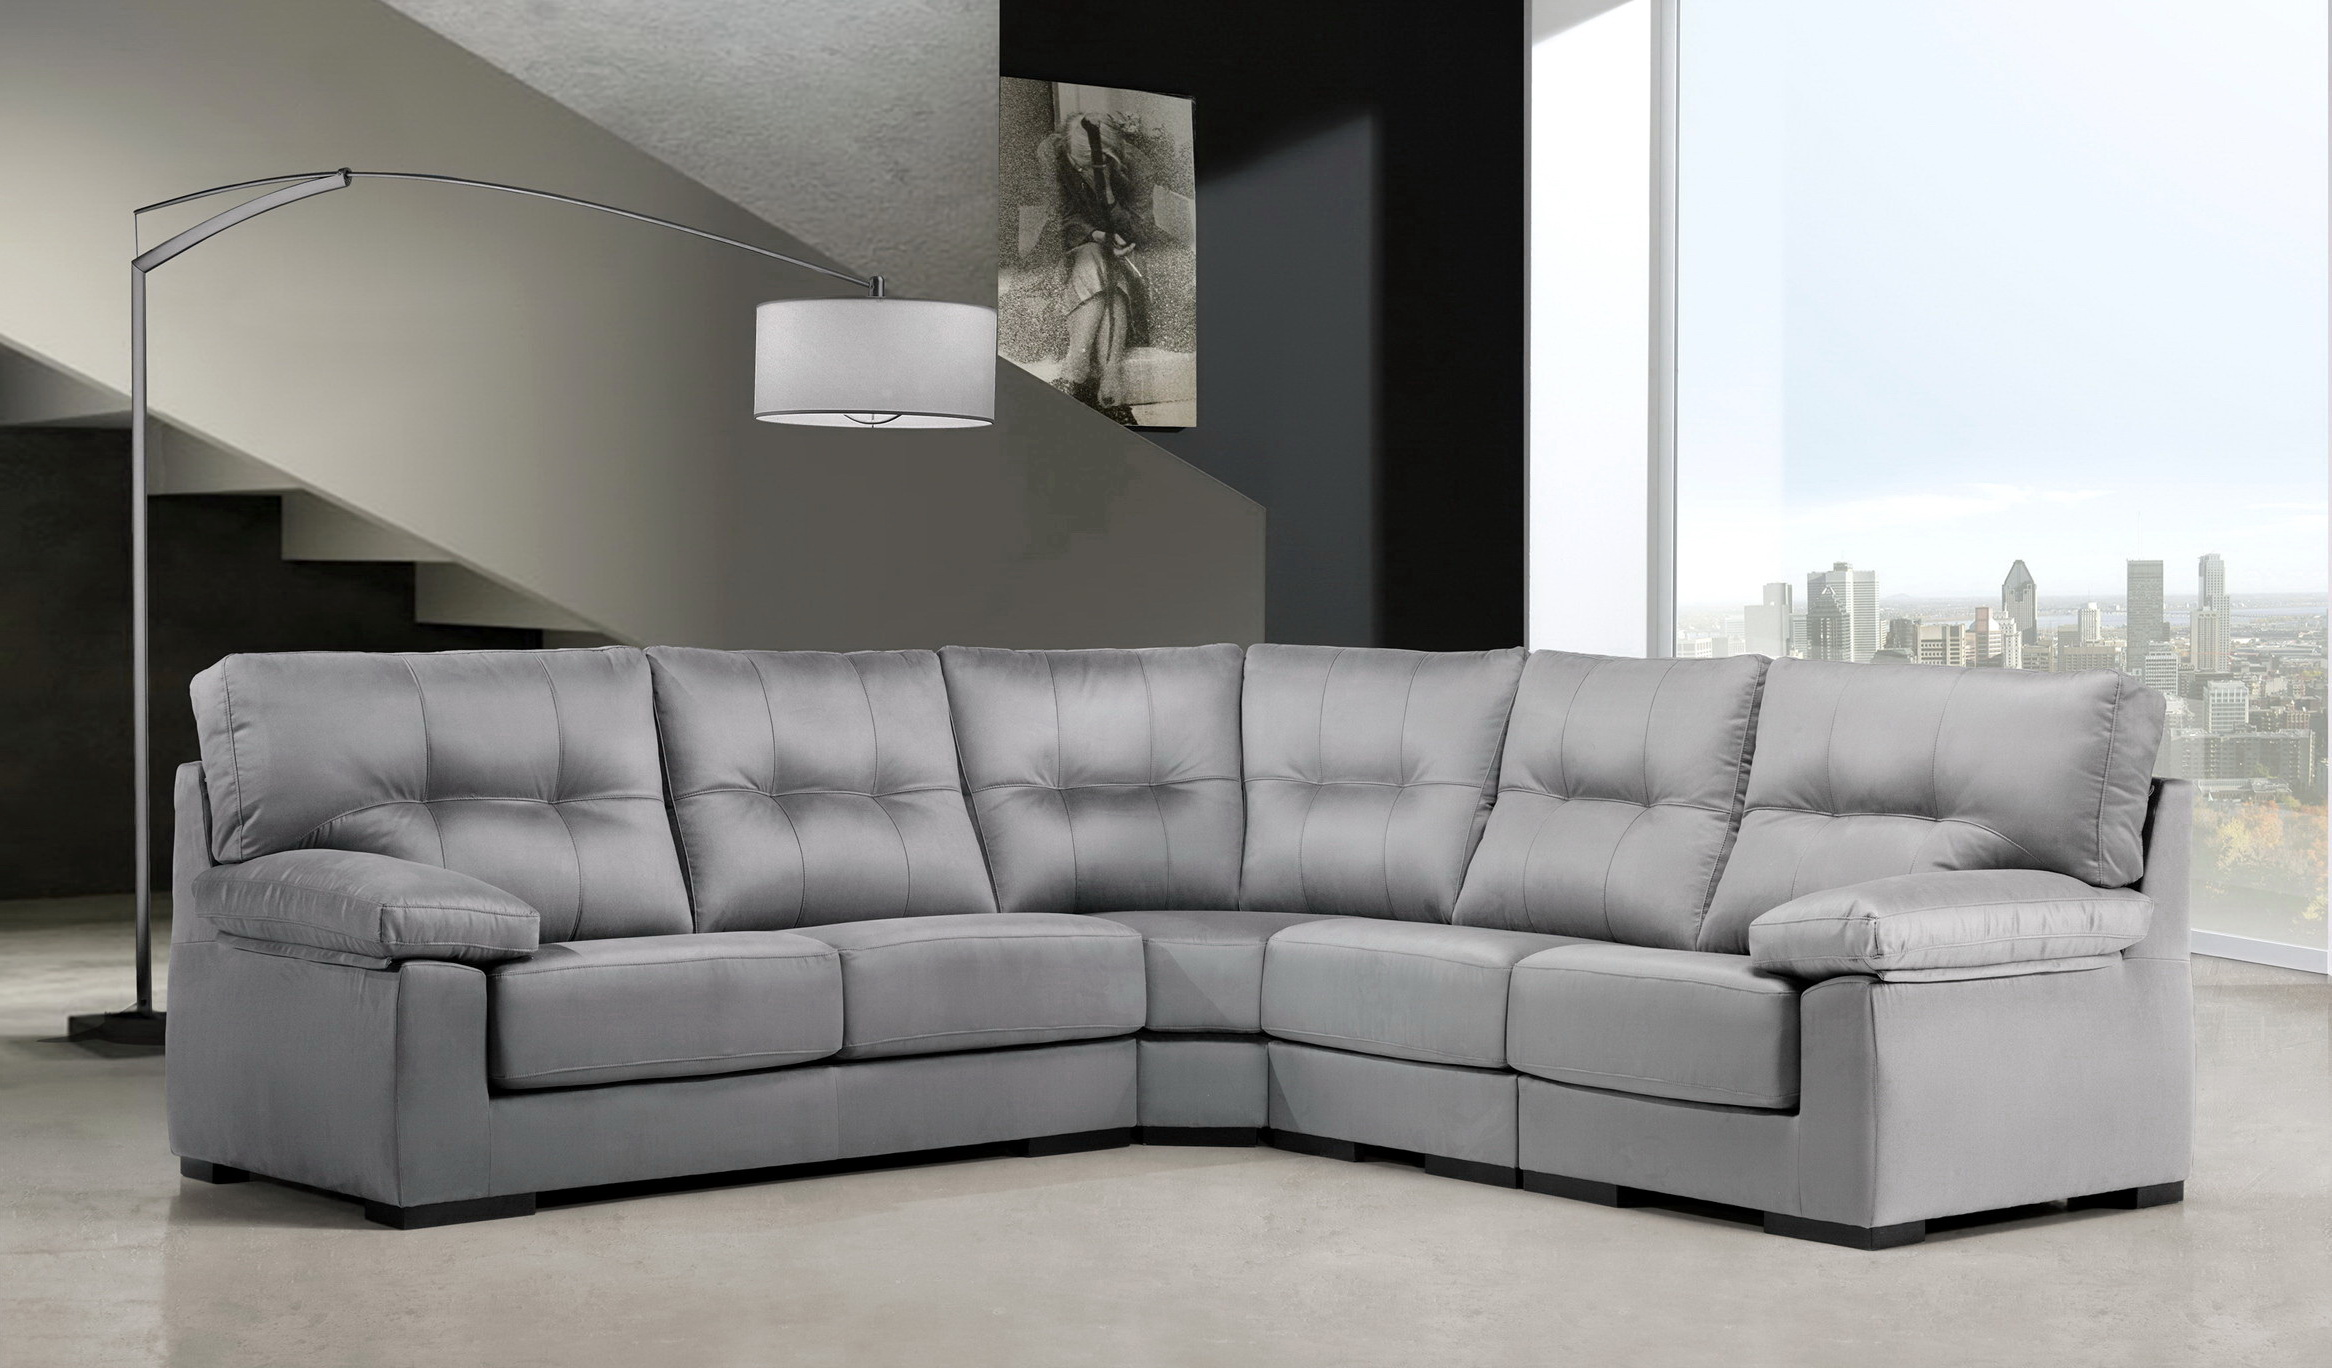 TOTTI sofá modular rinconera by Piccolo Confort 01 en muebles antoñán® León